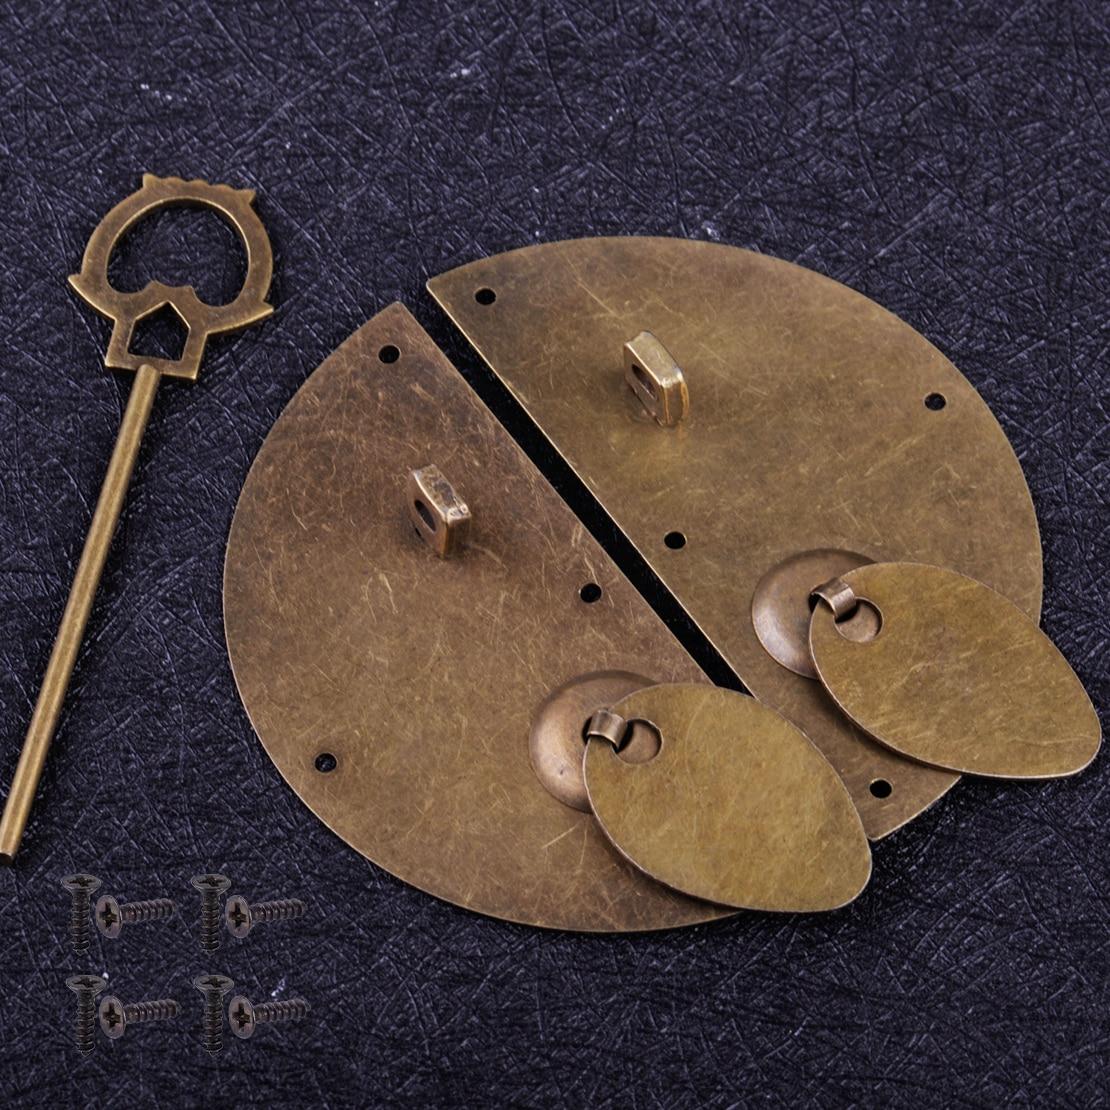 Vintage Chinese Ancient Style Antique bronze Door Knocking Cabinet Pull Latch Lock Retro Furniture Hardware